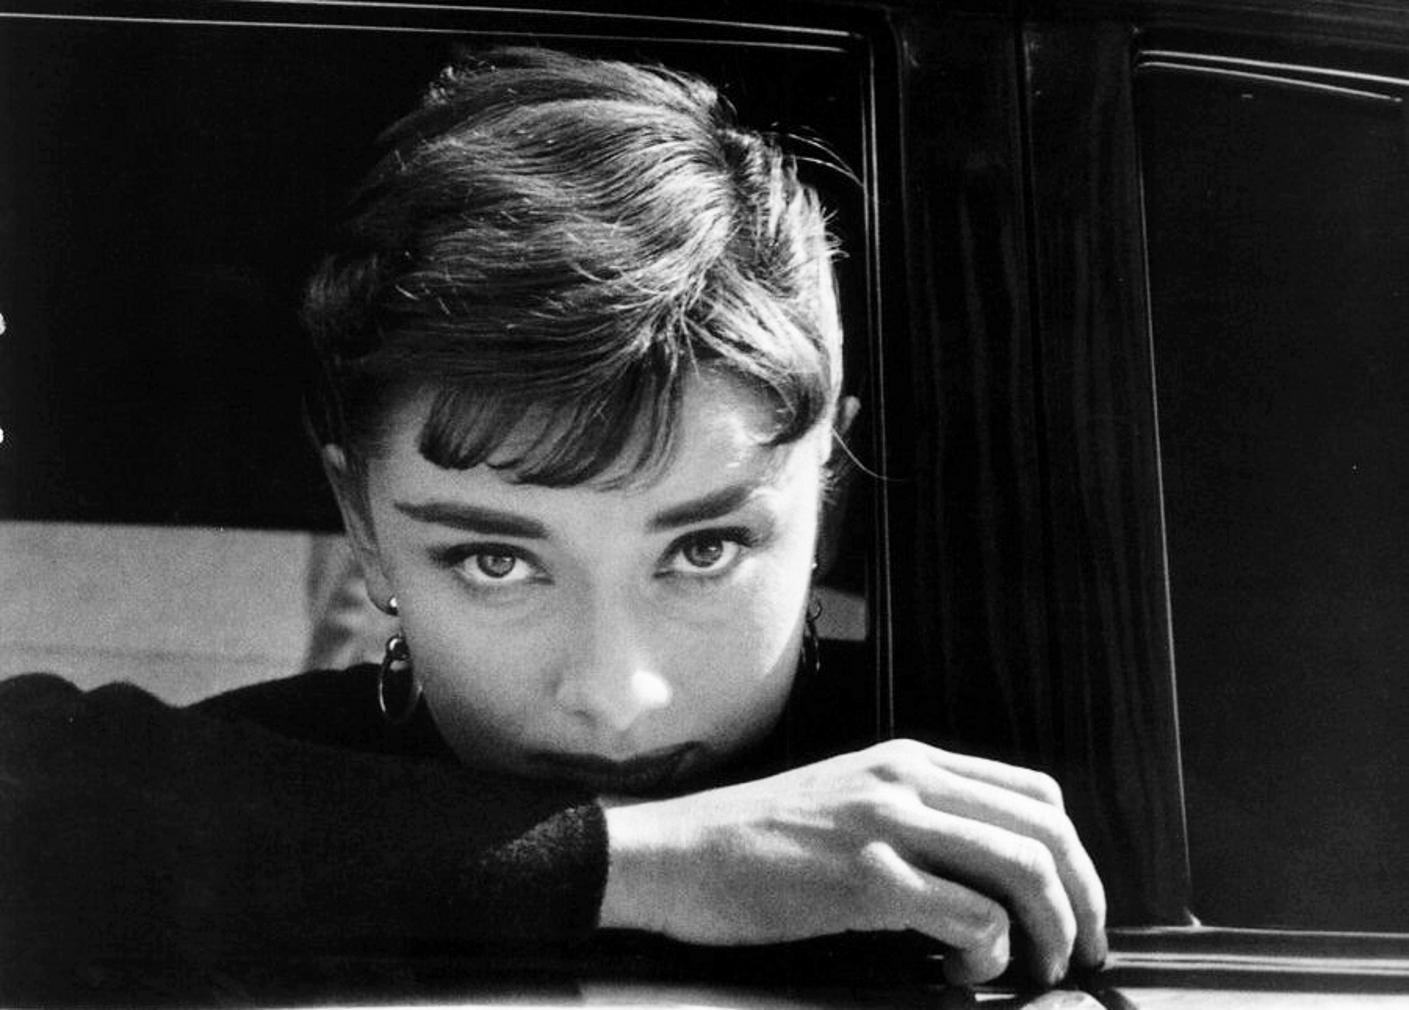 Audrey Hepburn Wallpapers HD Wallpapers Early 1409x1010